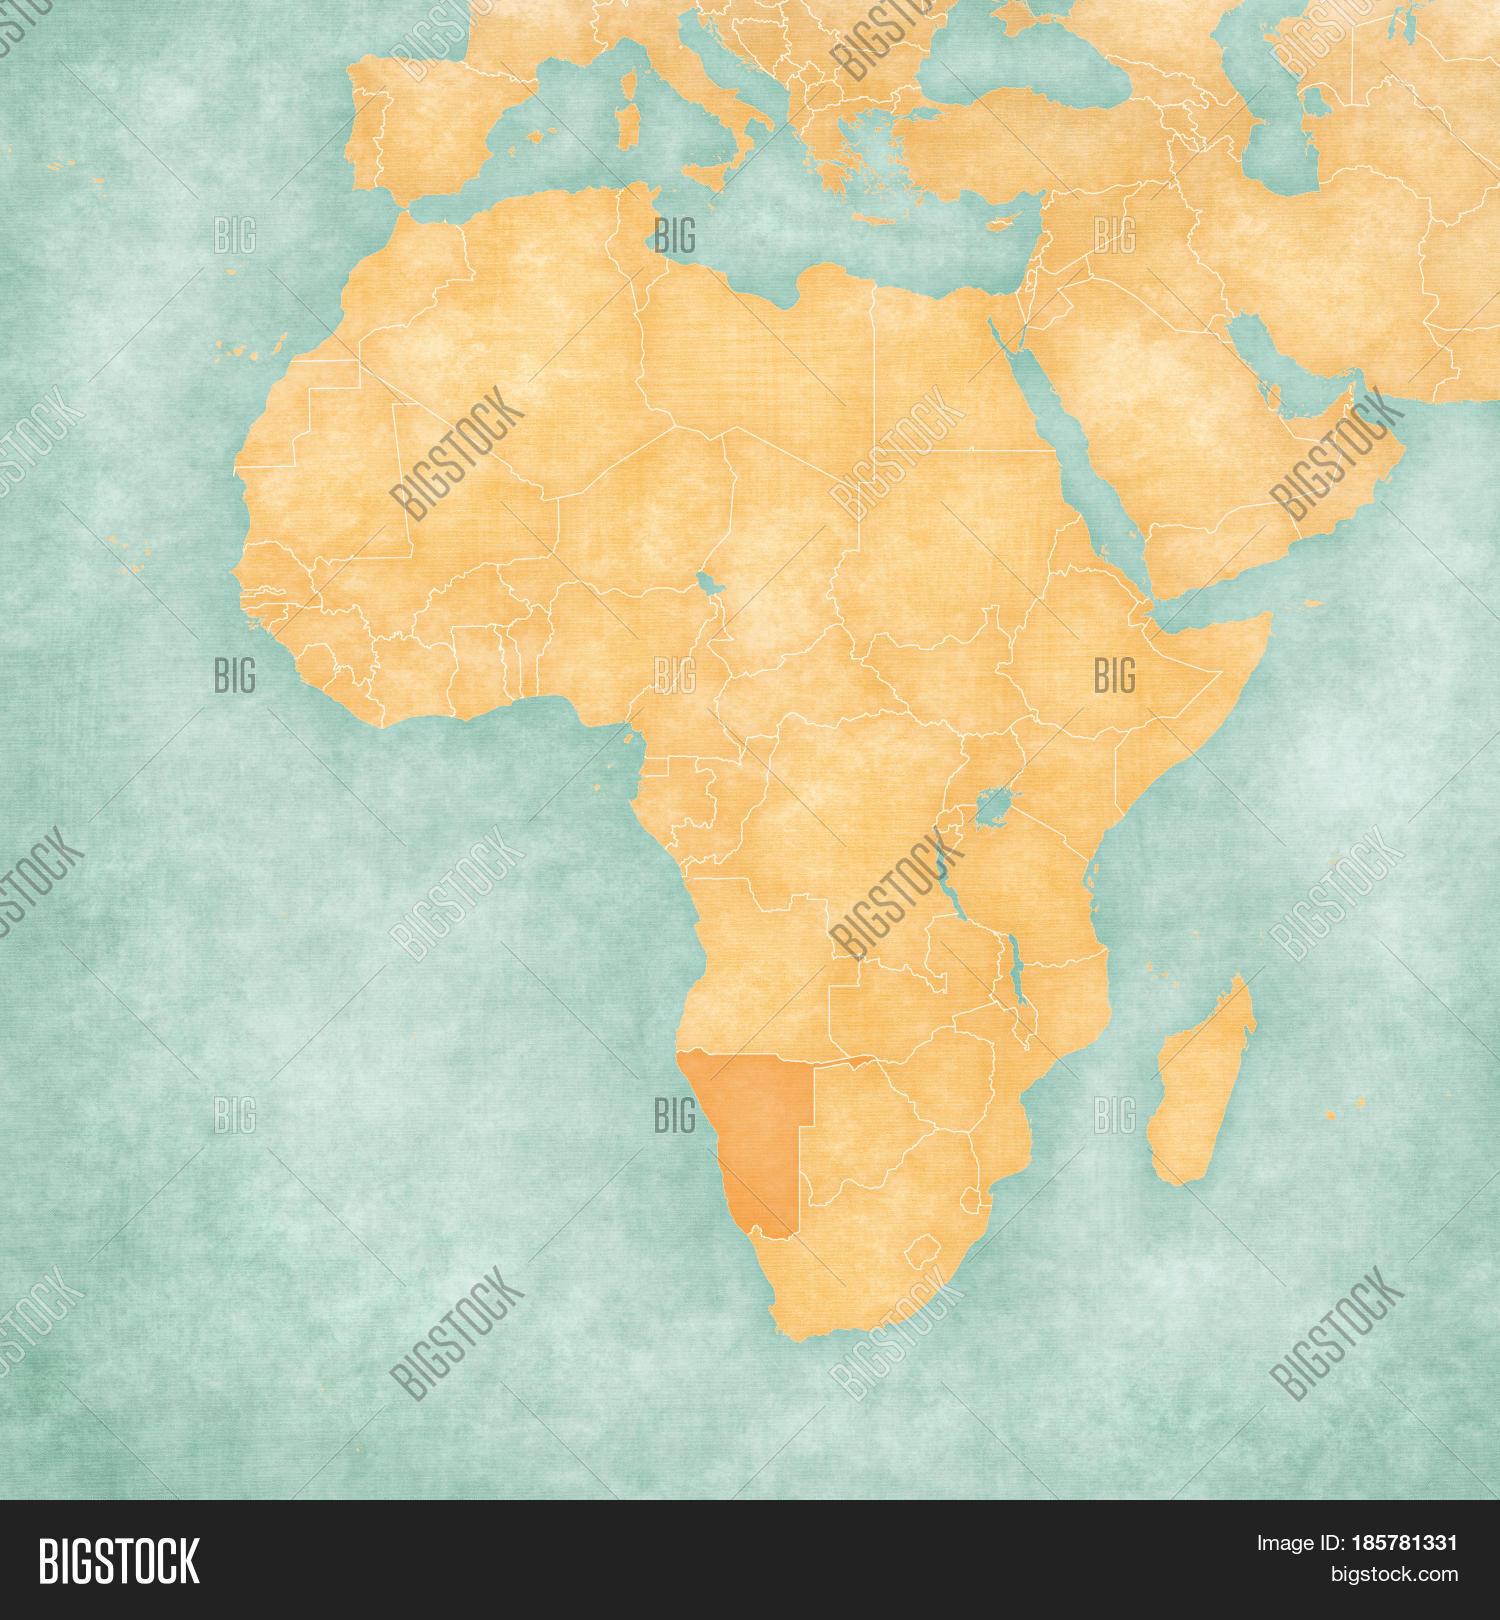 Map Africa - Namibia Image & Photo (Free Trial) | Bigstock